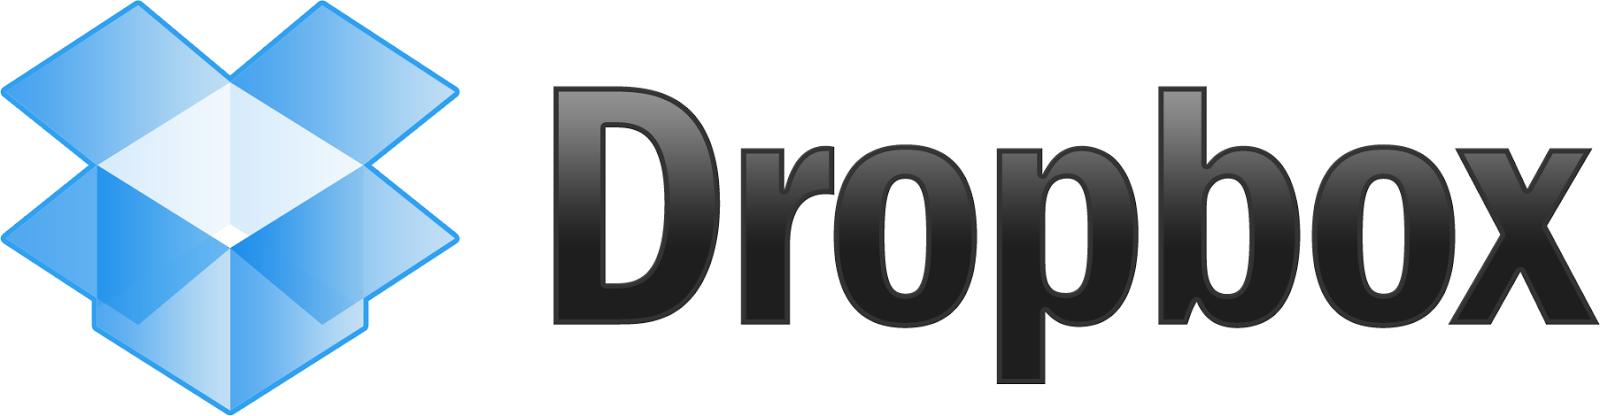 Héberger Un Site Web Avec Dropbox dropbox logo1